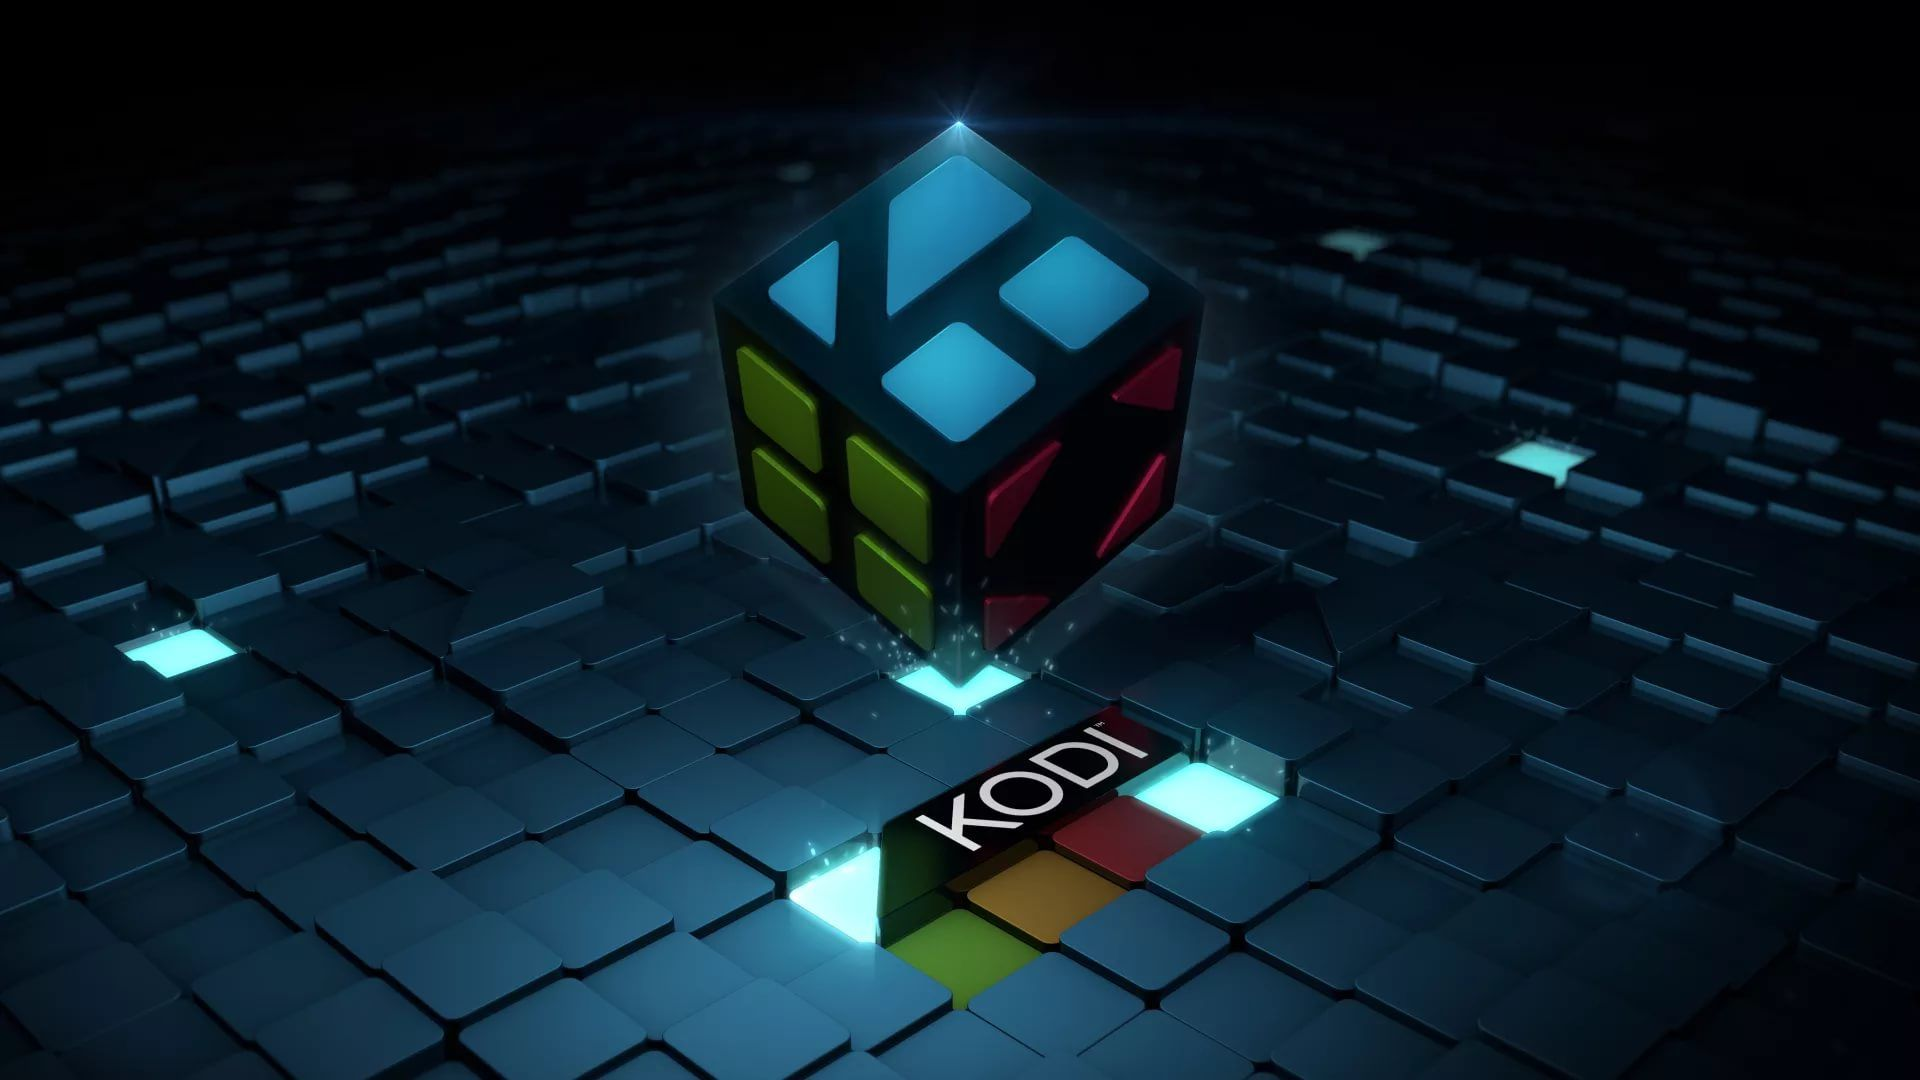 Kodi HD Desktop Wallpaper